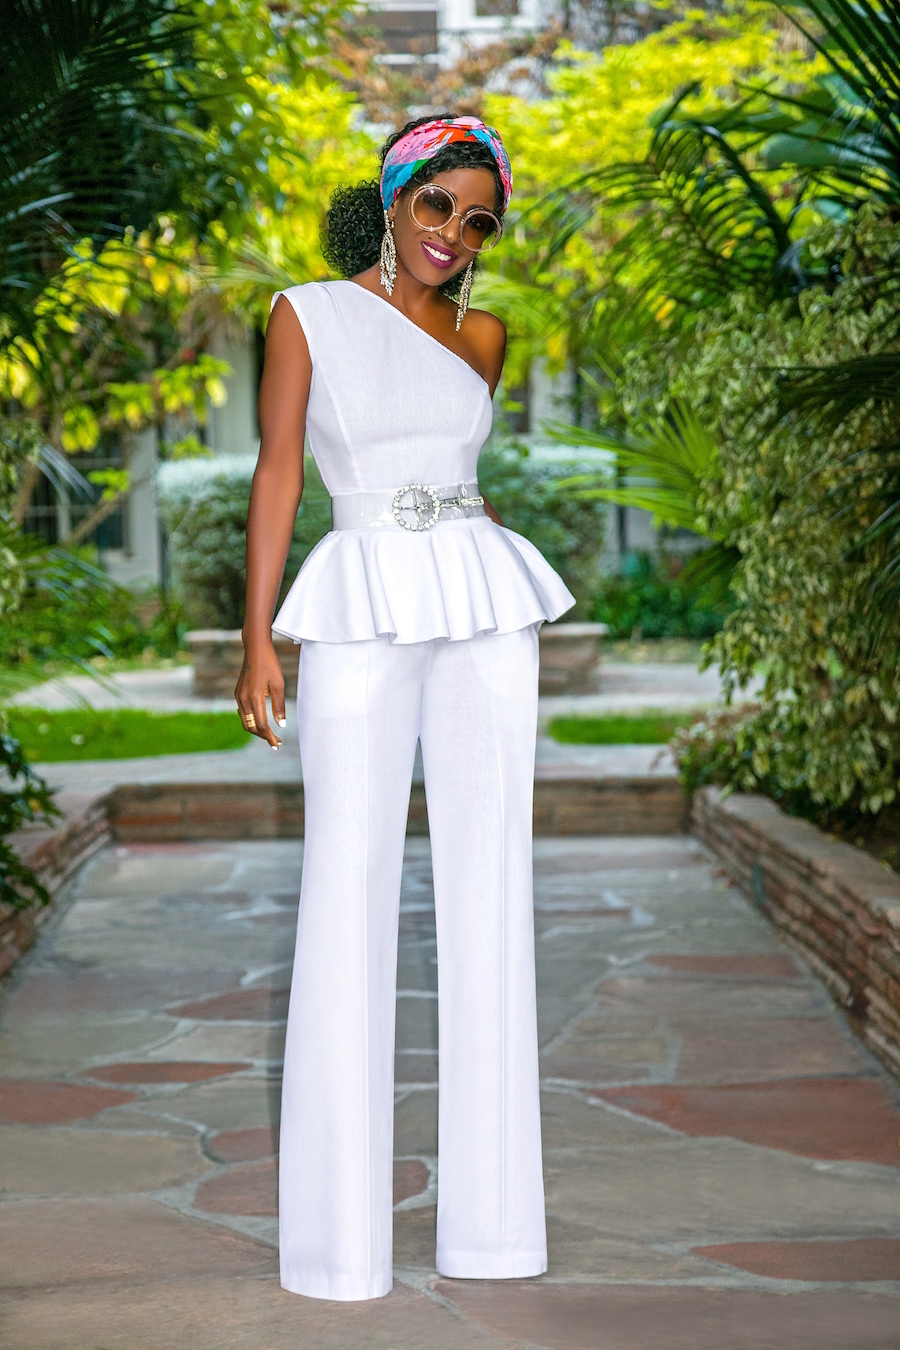 Style Pantry One Shoulder Peplum Top High Waist Pants